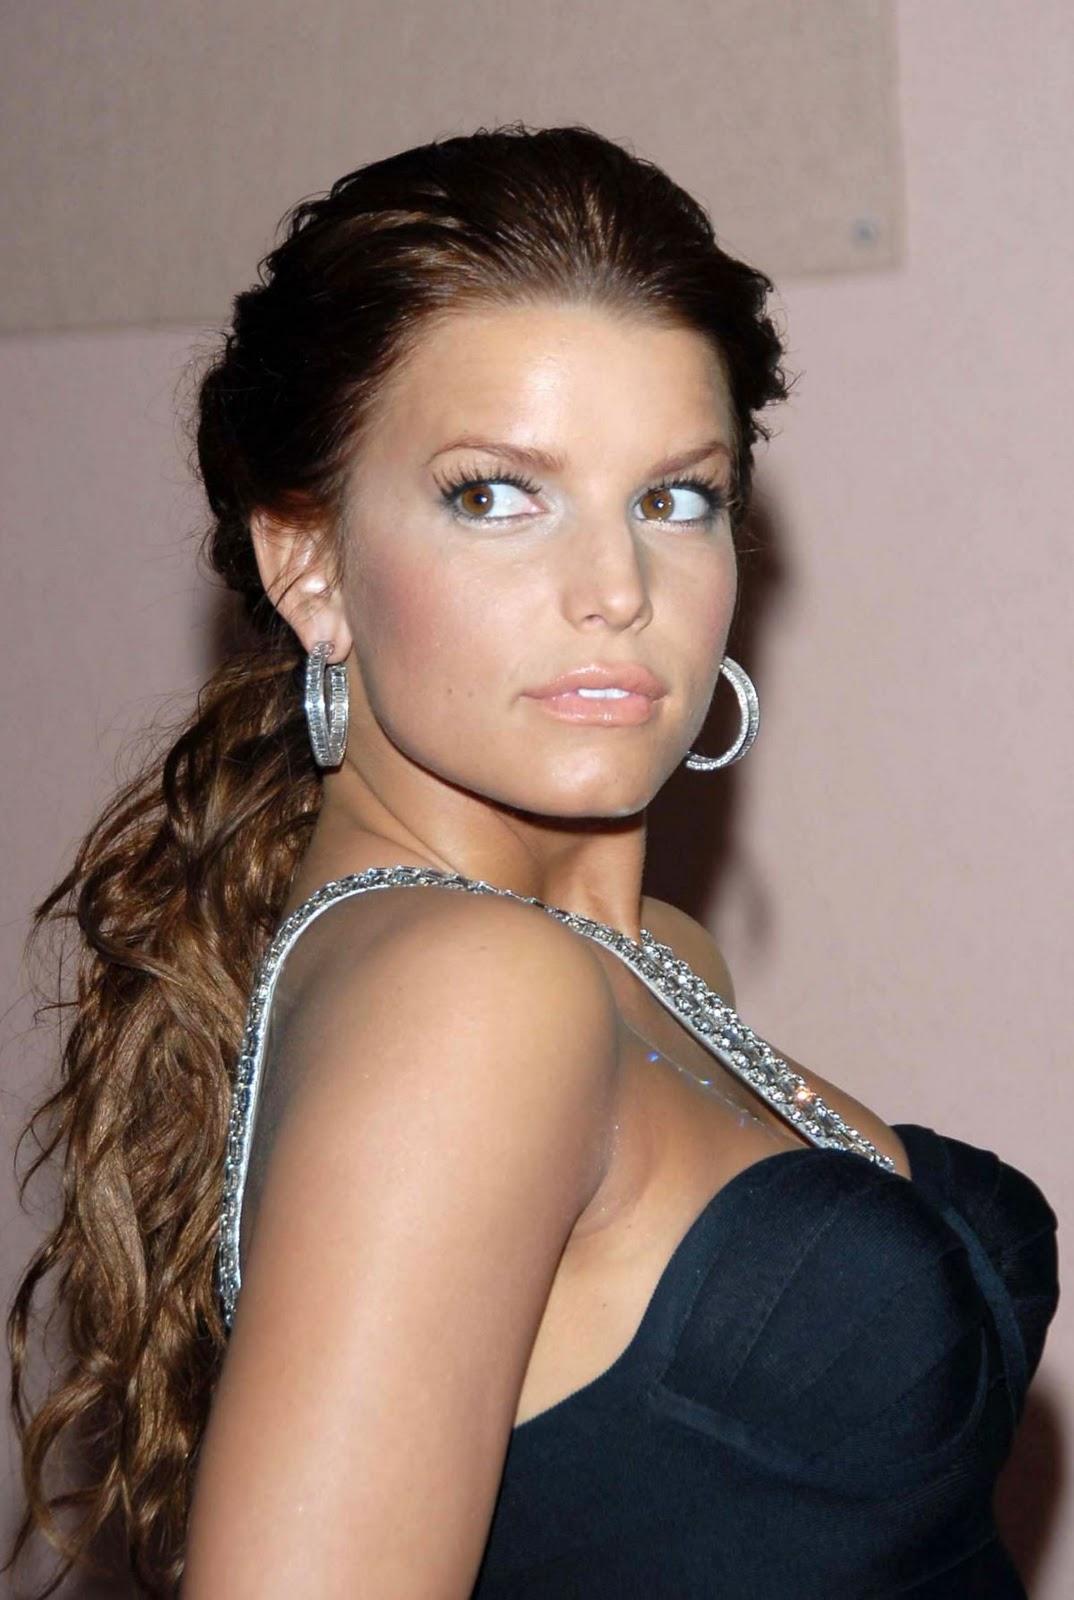 Top Model Bugil Jessica Simpson Amazing Breast